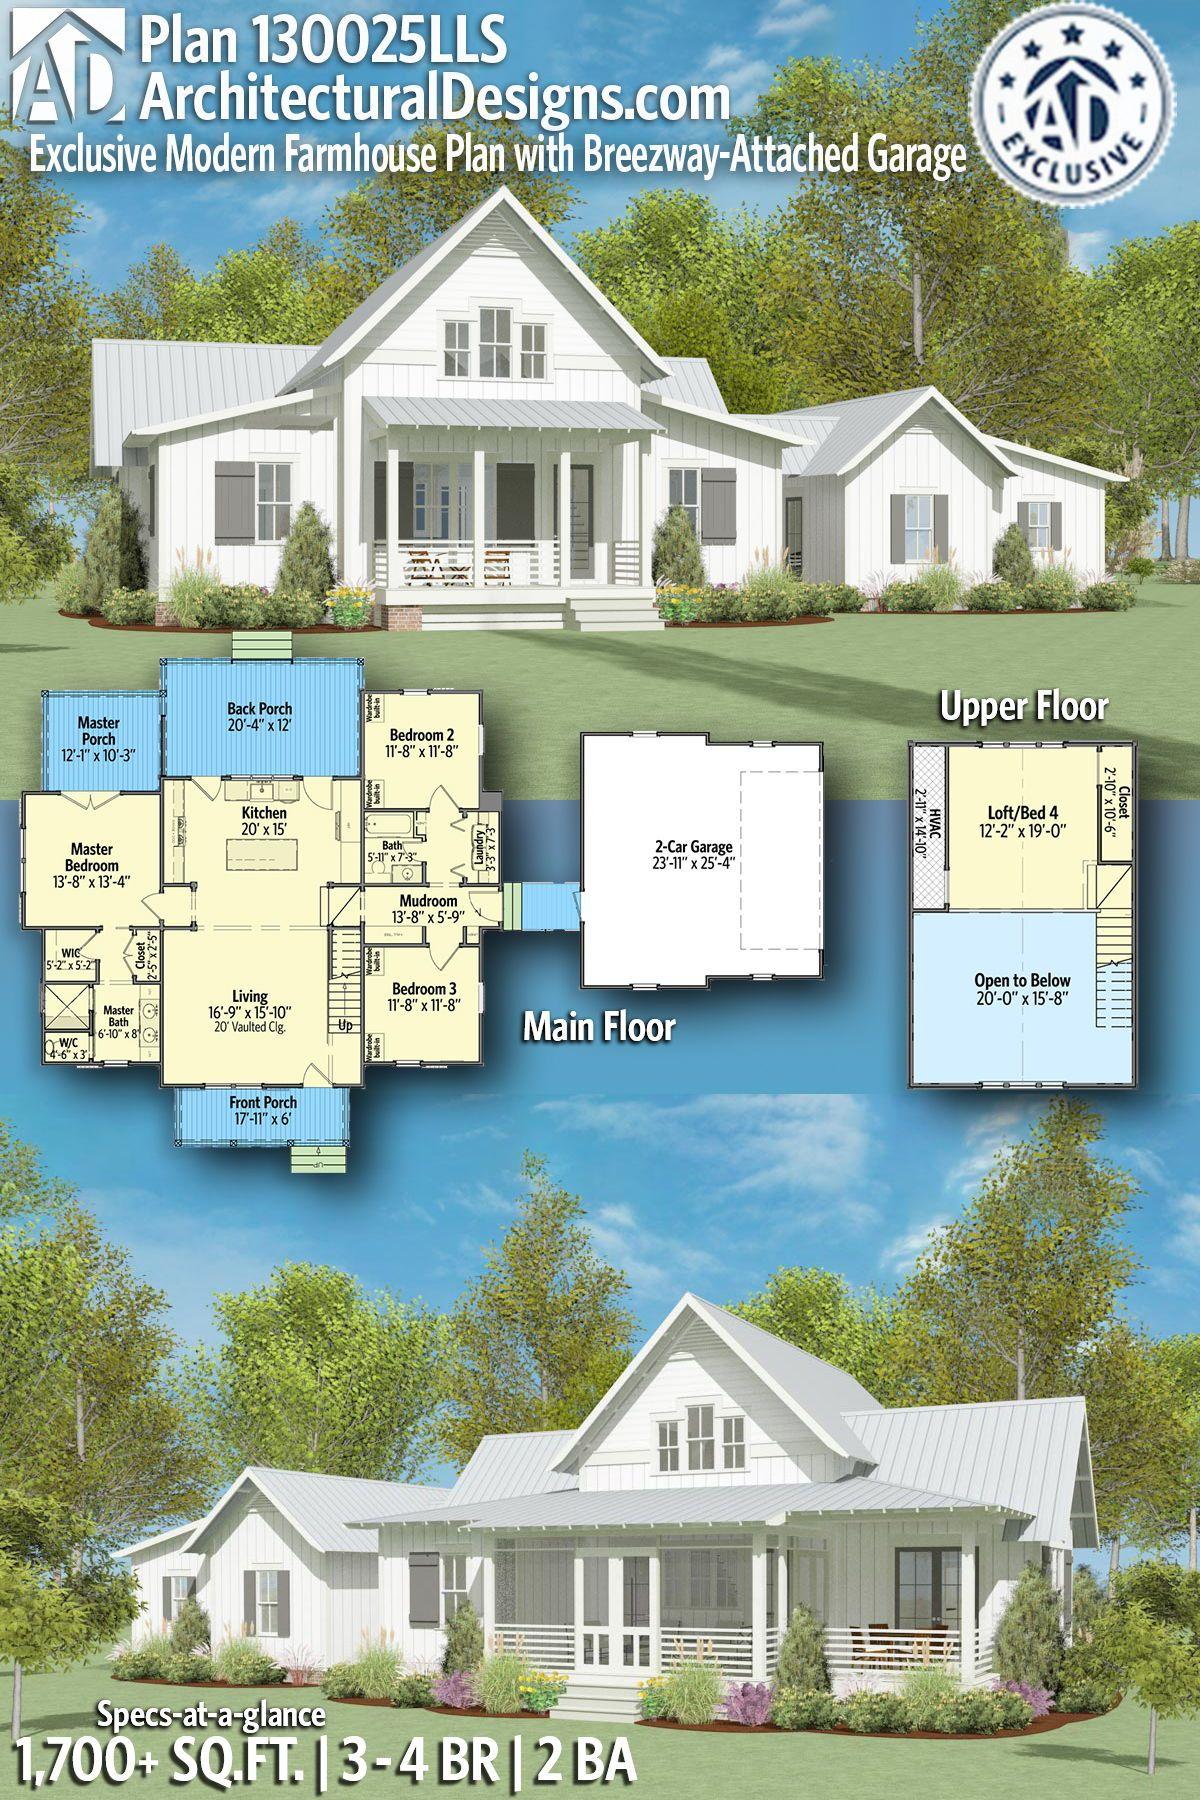 Plan 130025lls Exclusive Modern Farmhouse Plan With Breezeway Attached Garage Farmhouse Plans Modern Farmhouse Plans Country House Plans